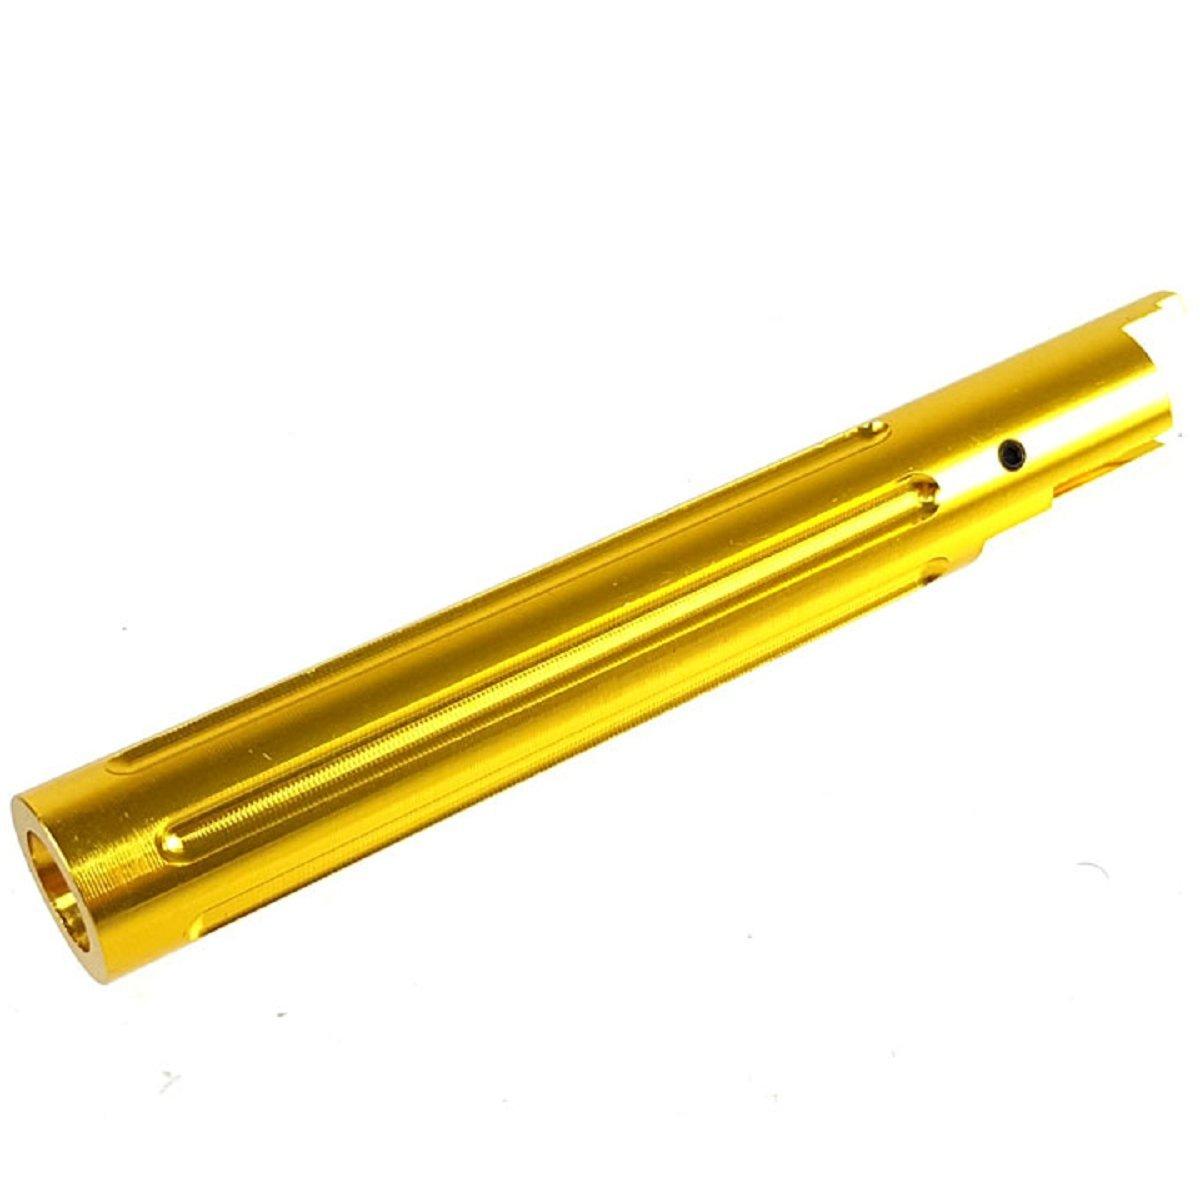 Airsoft 5KU Non-Recoil Spiral Outer Barrel For Hi-Capa 5.1 GBB Silver